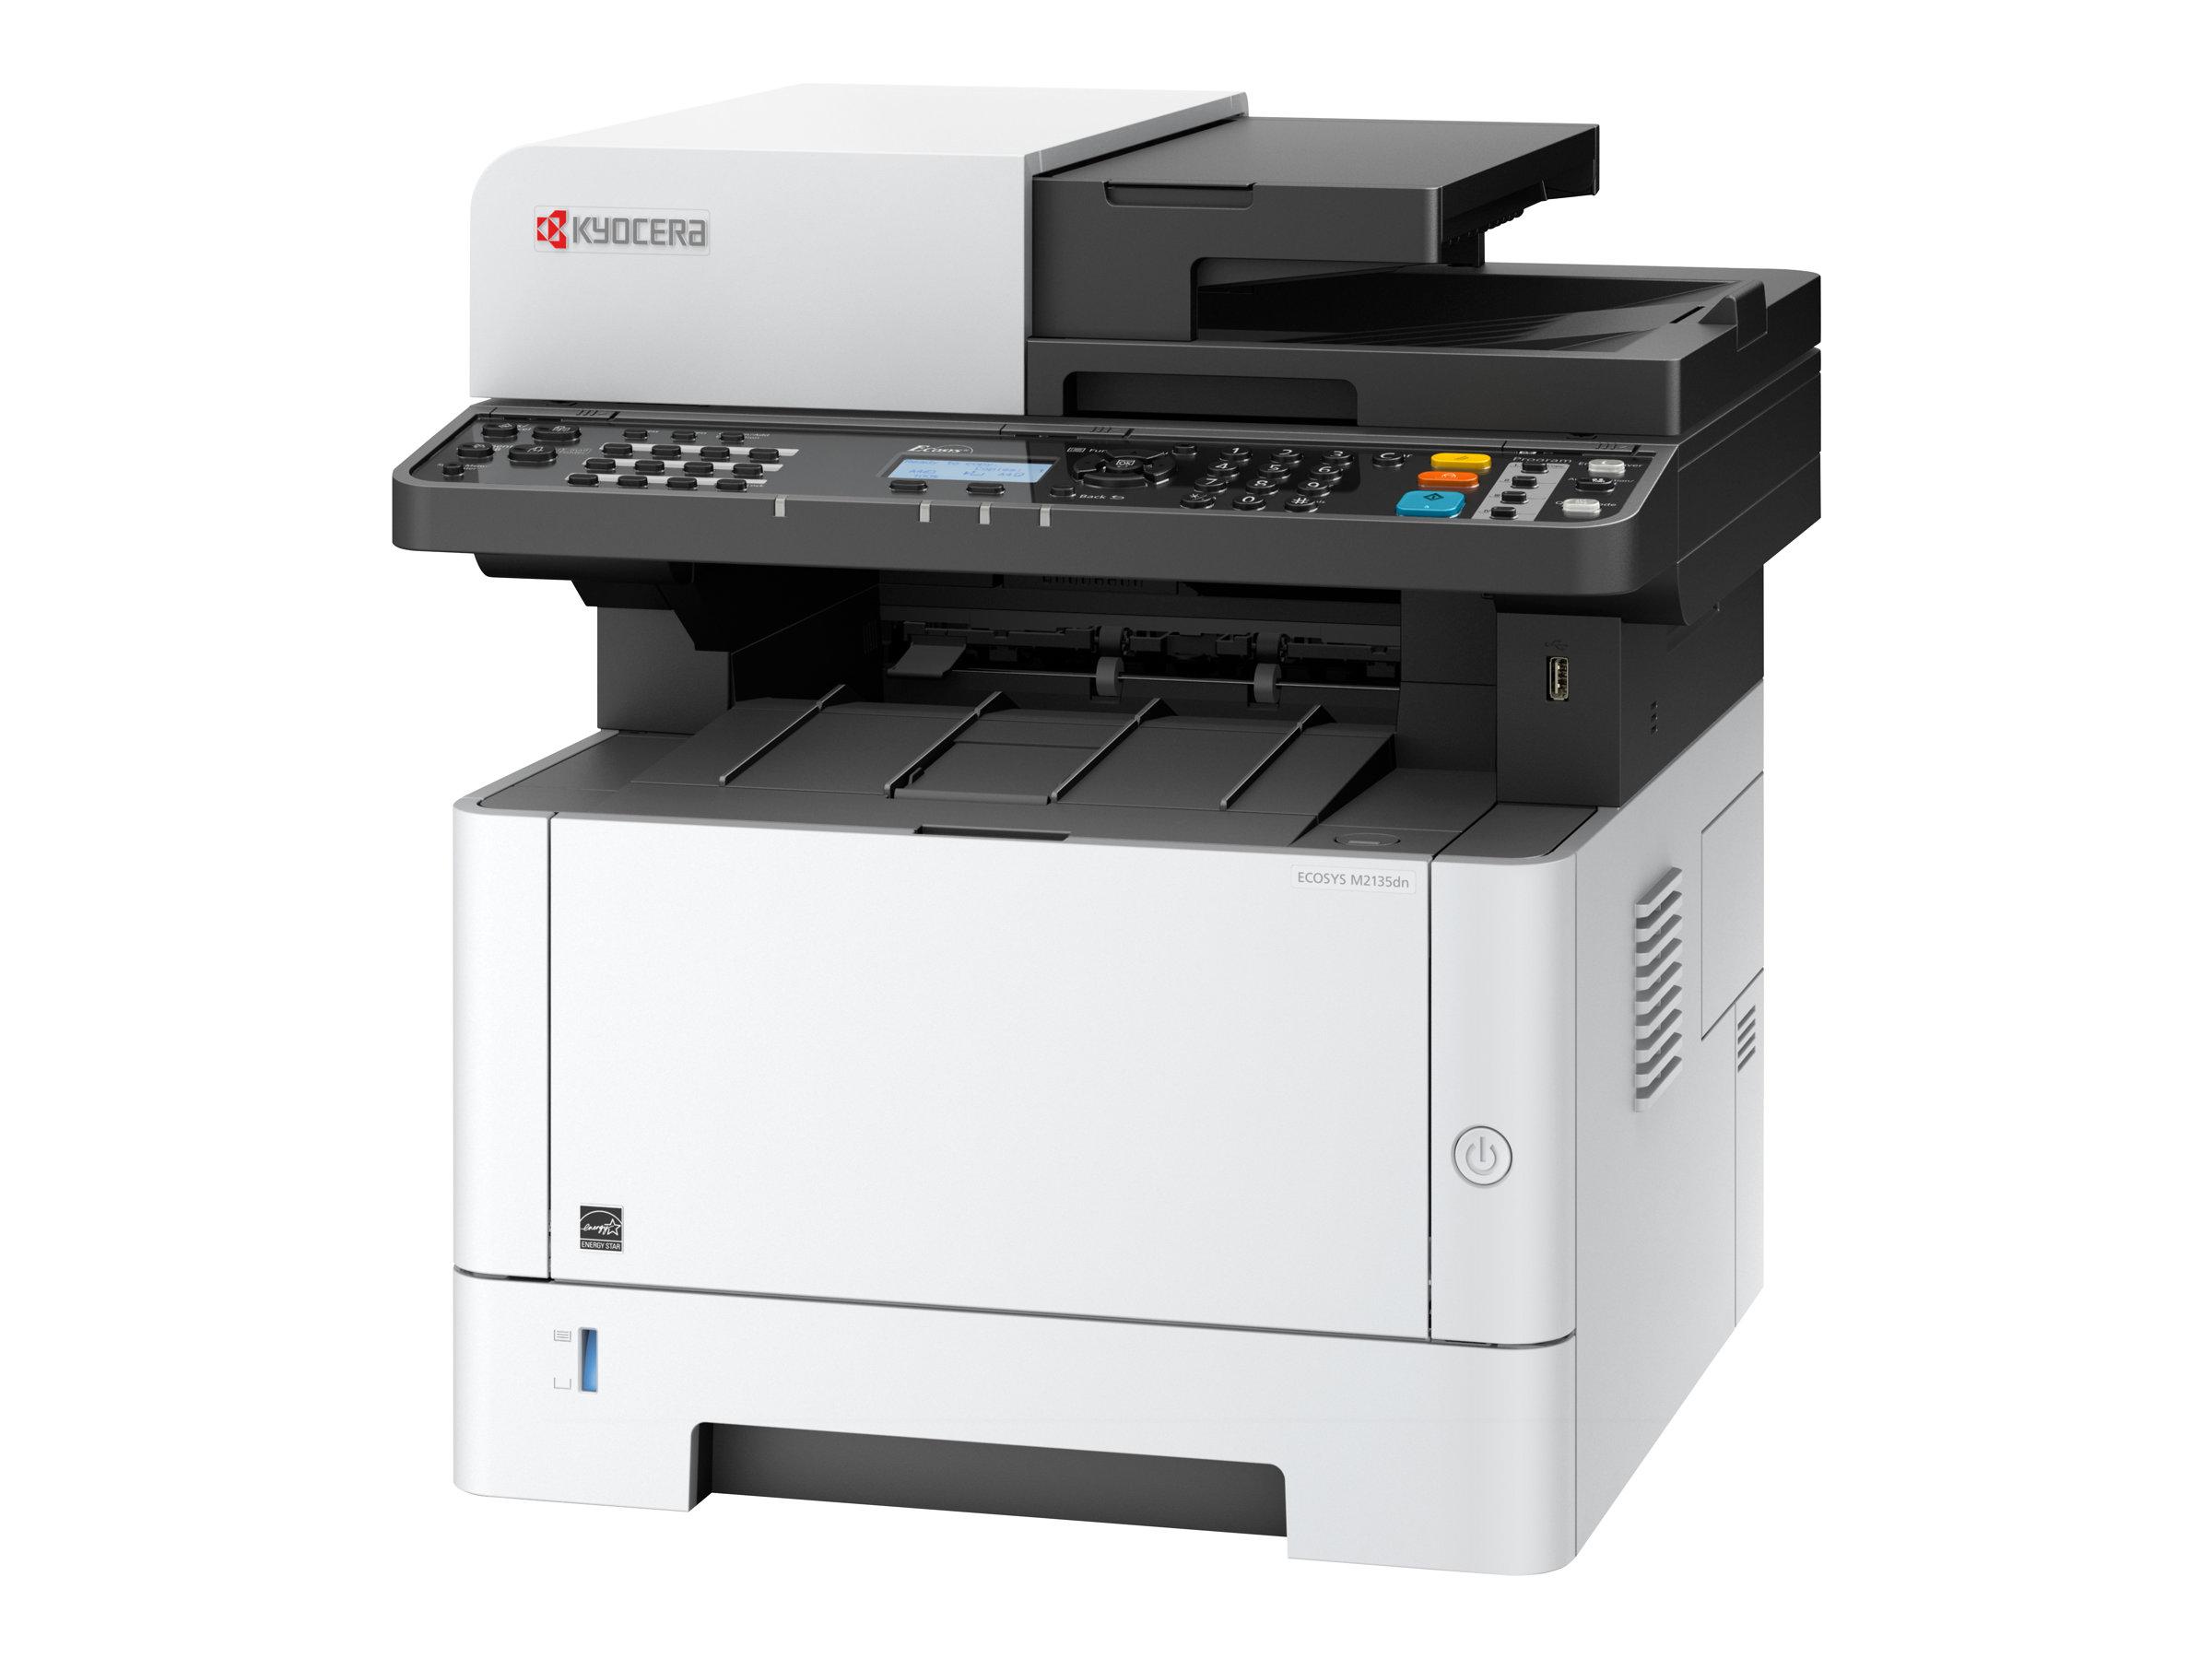 Kyocera ECOSYS M2135dn - Multifunktionsdrucker - s/w - Laser - Legal (216 x 356 mm) (Original) - A4/Legal (Medien)